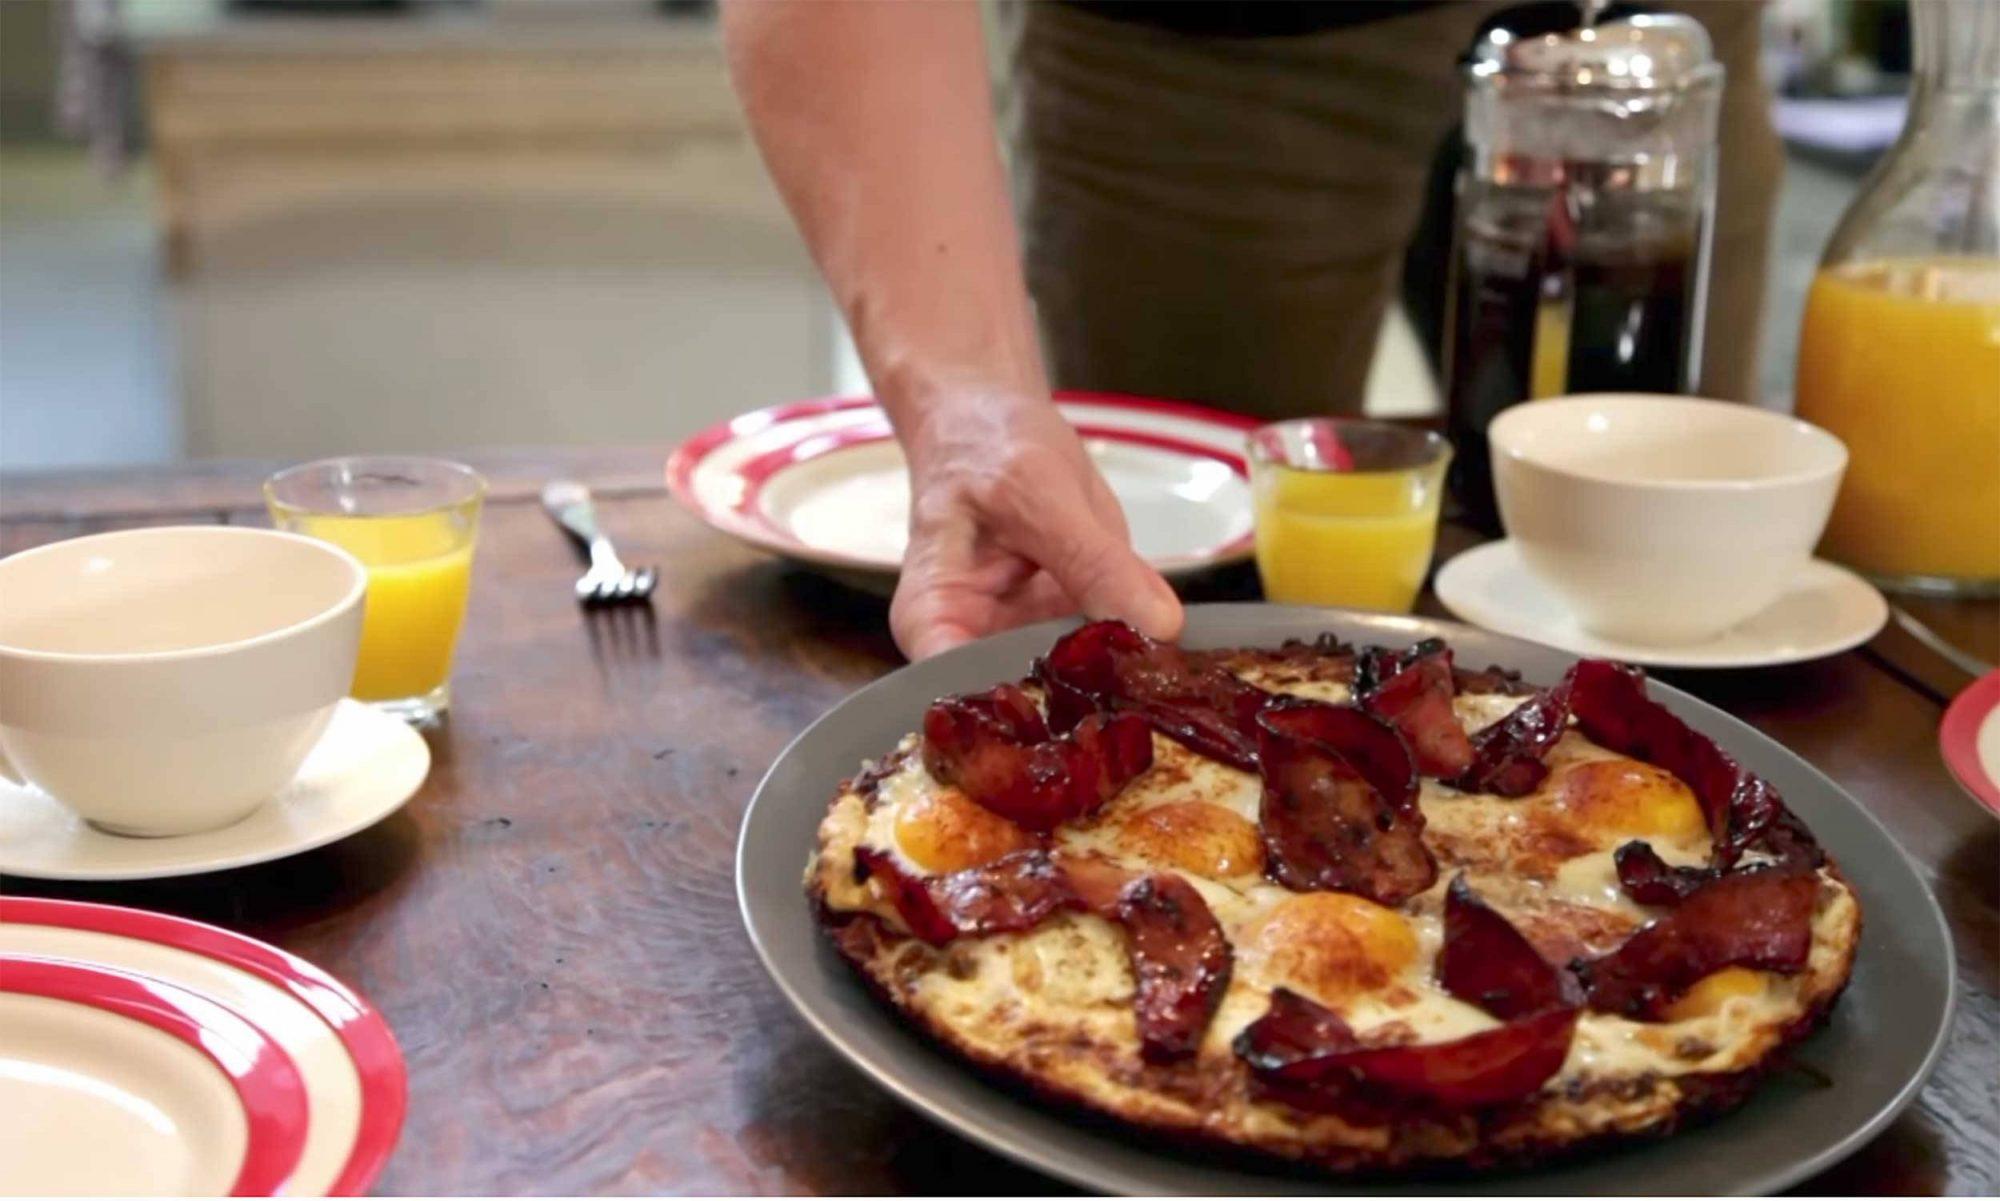 EC: Gordon Ramsay's 'American Breakfast' Is Confusing